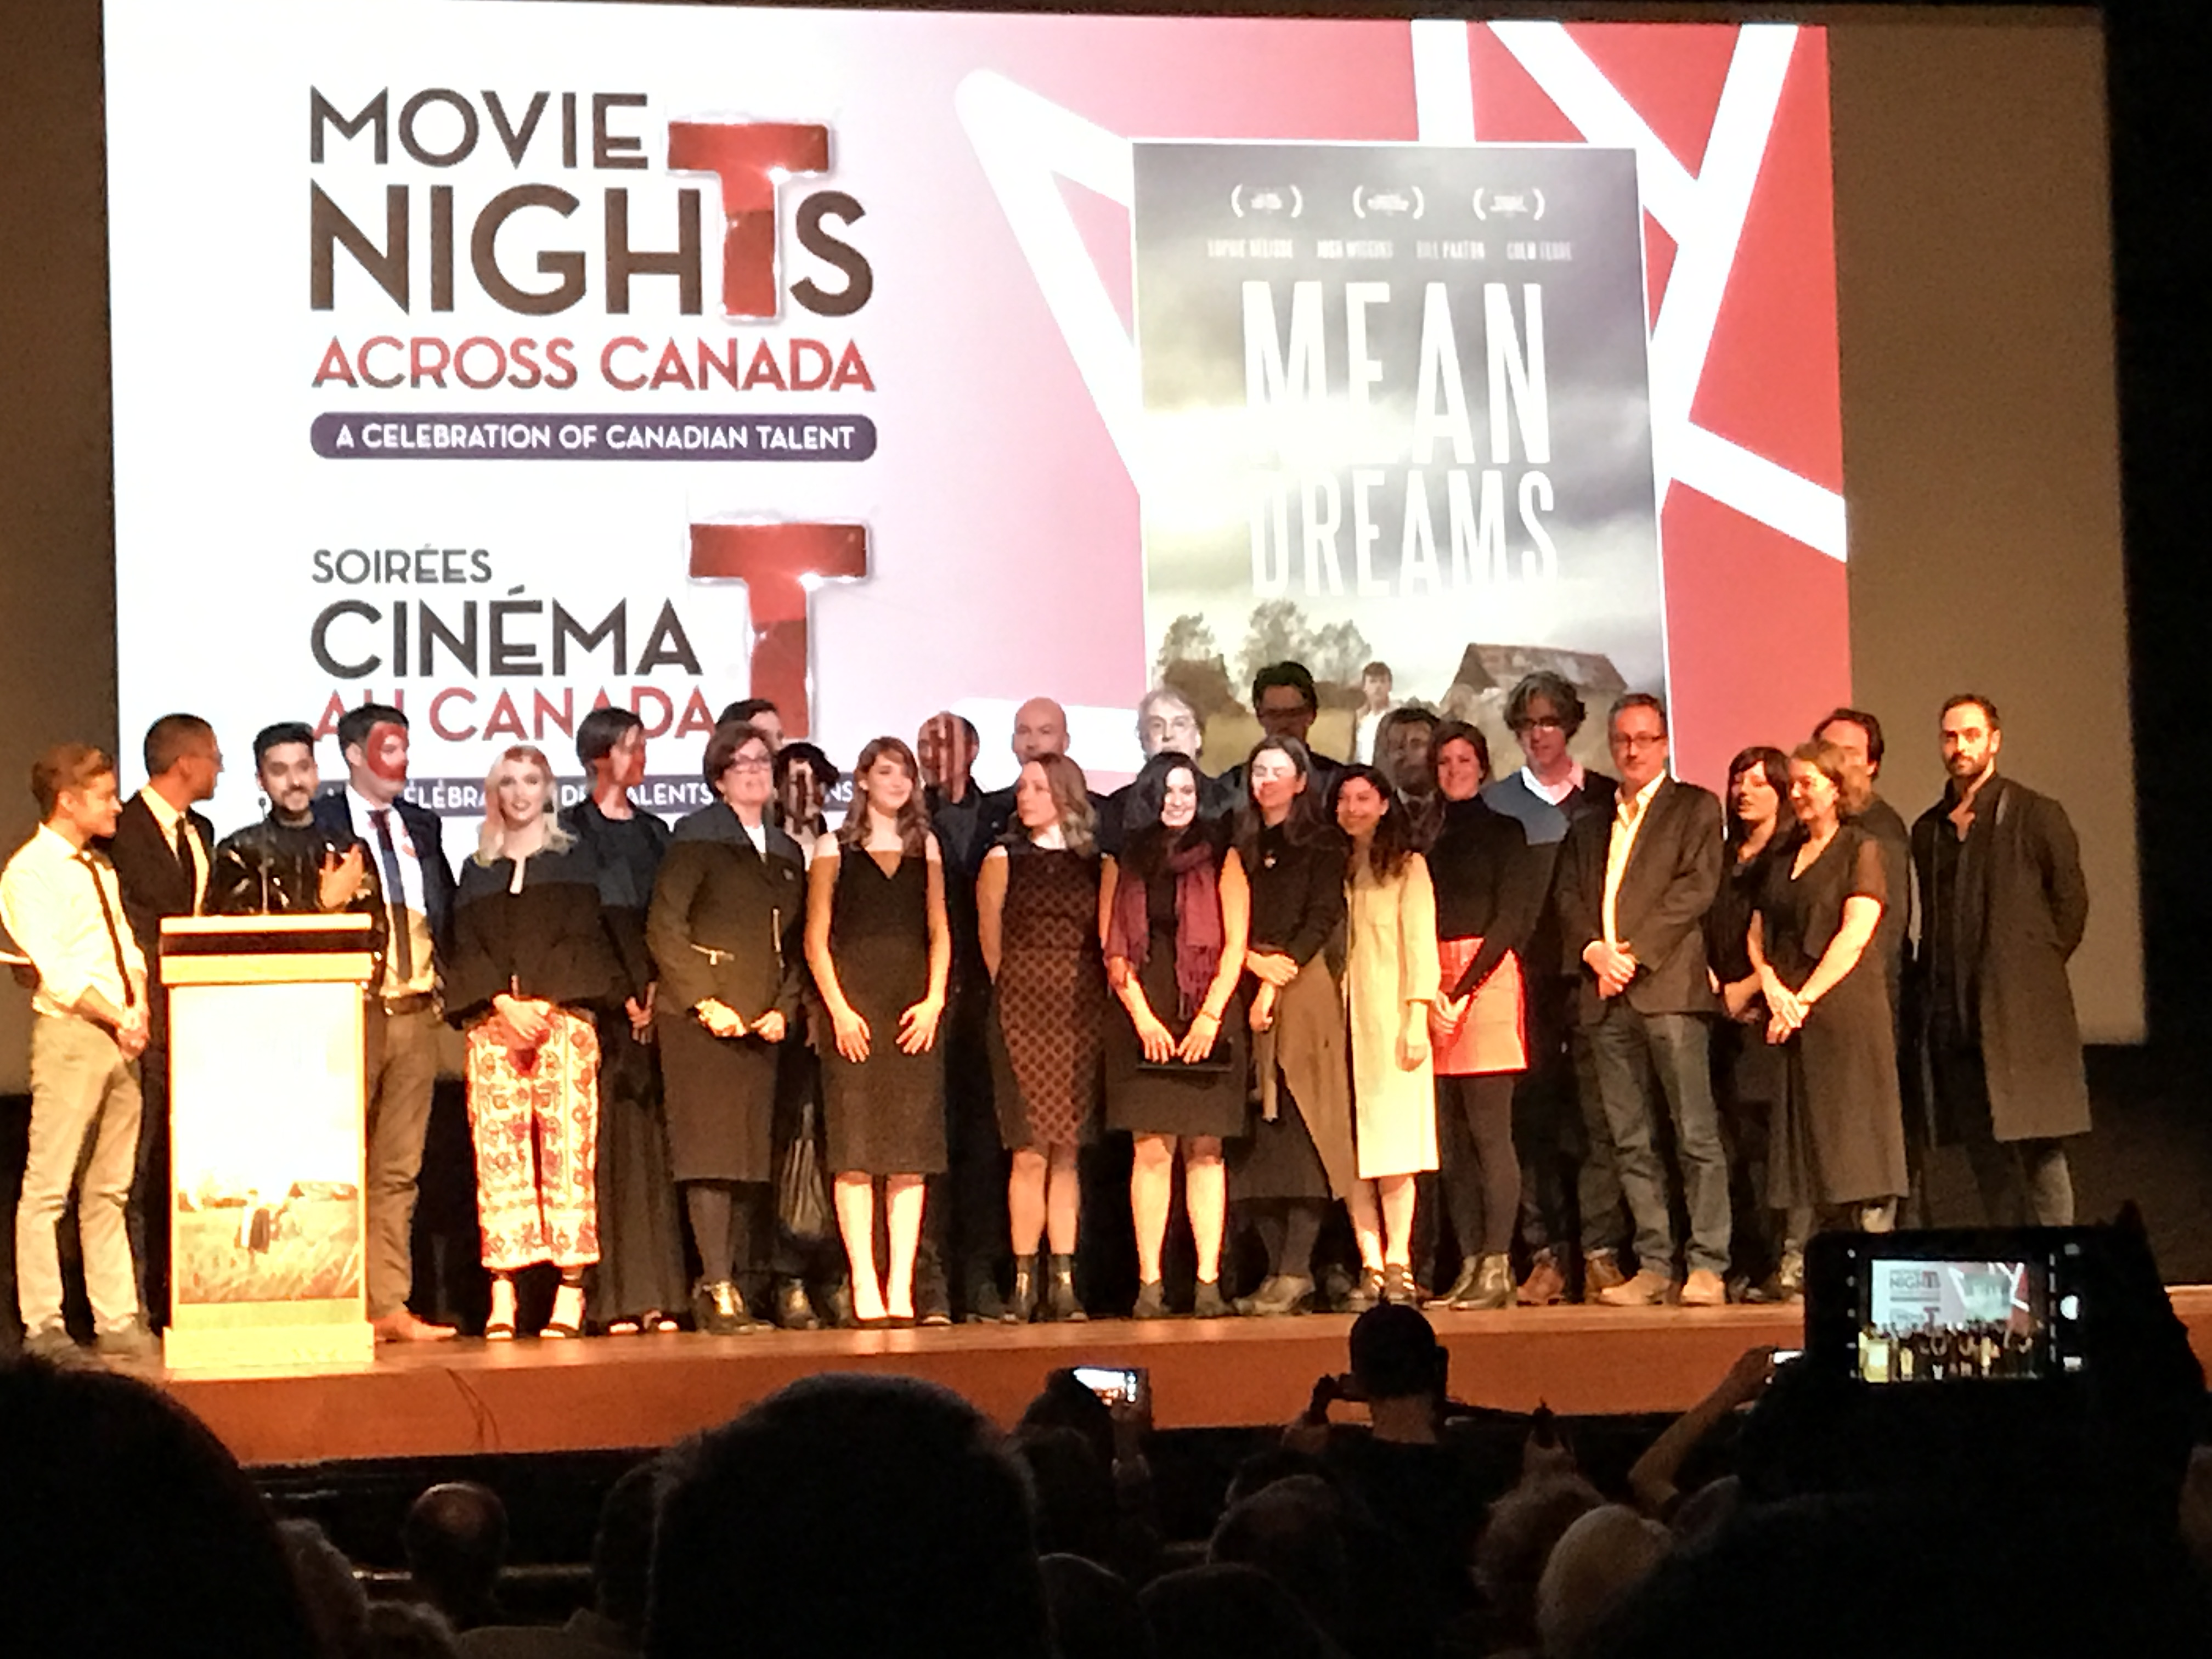 Movie Nights Across Canada #MovieNightsCA